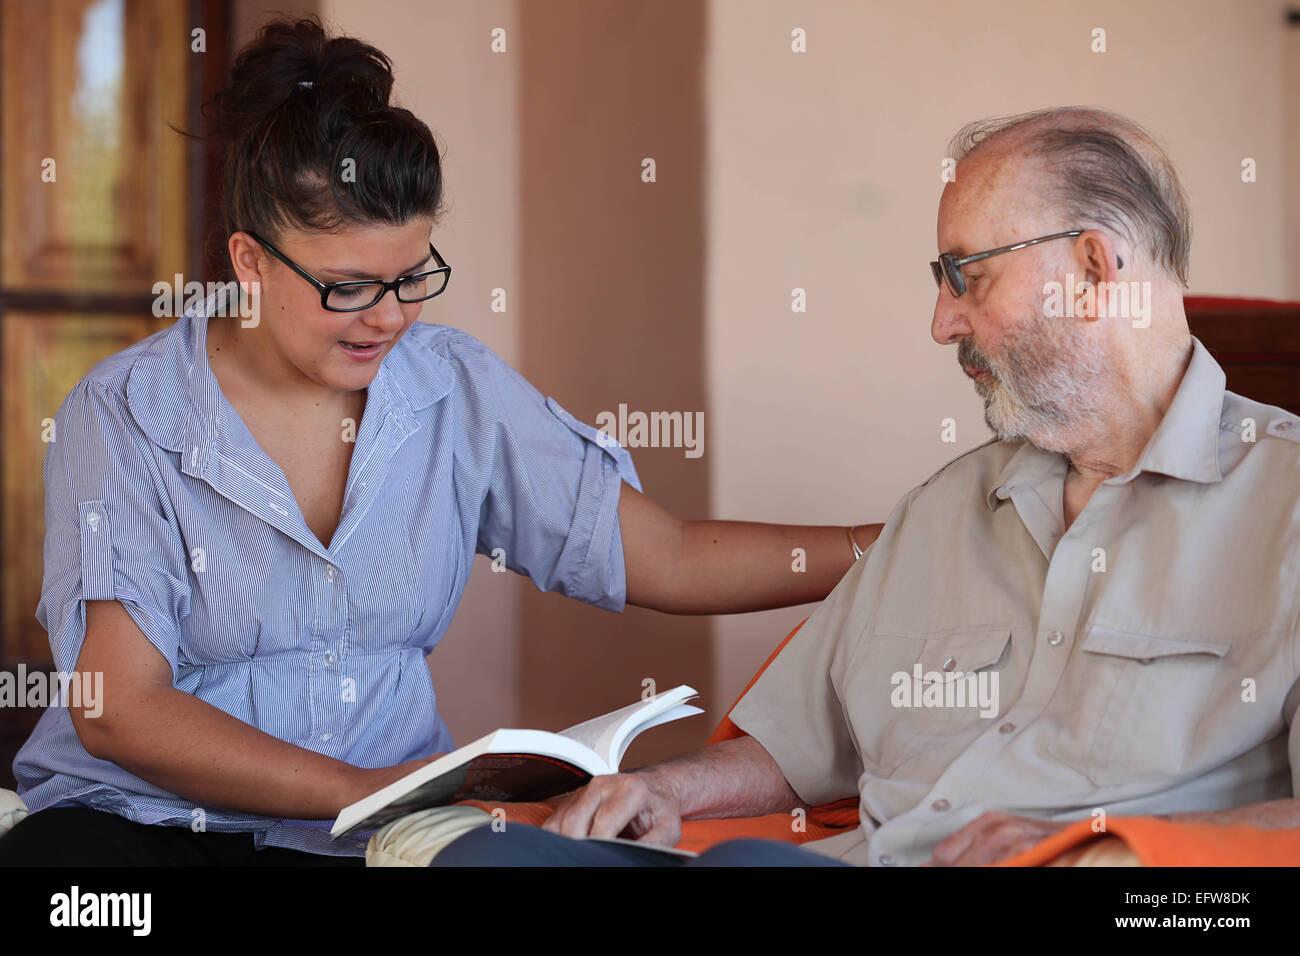 companion or grandchild reading to elderly senior or grandfather - Stock Image